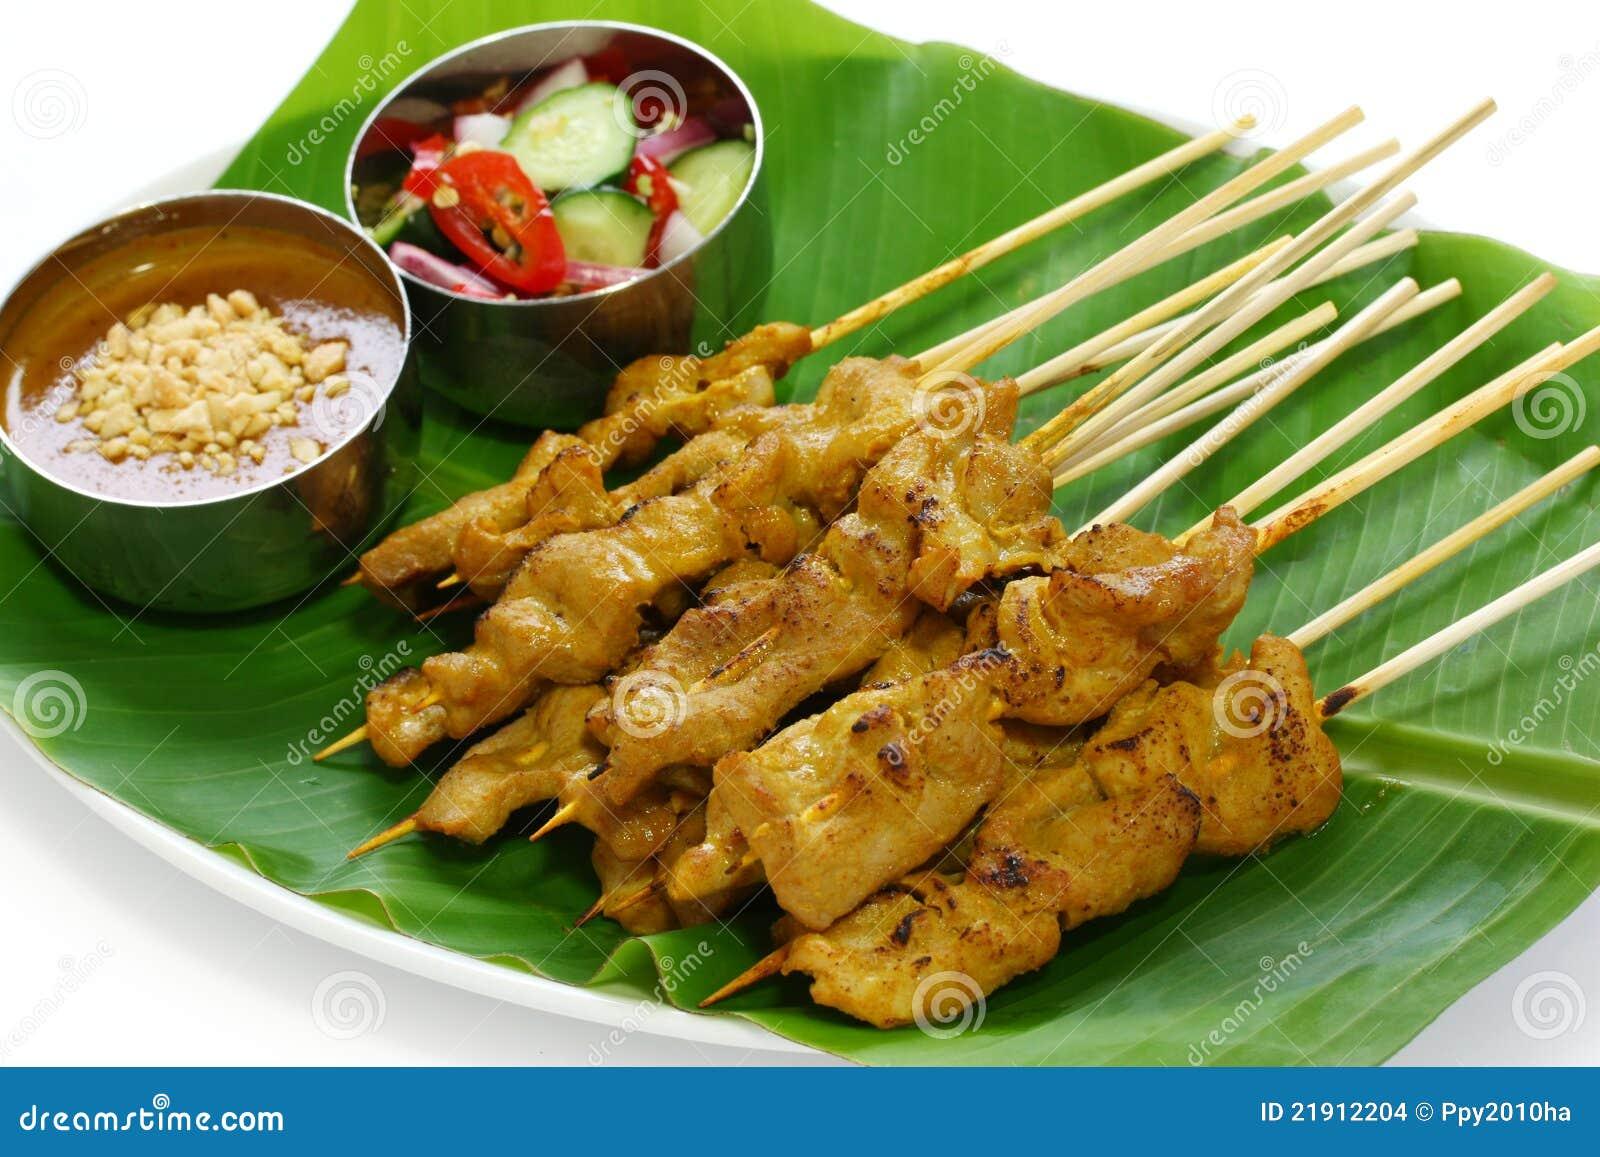 ... satay sauce soy sauce and sesame tofu satay beef satay with ginger